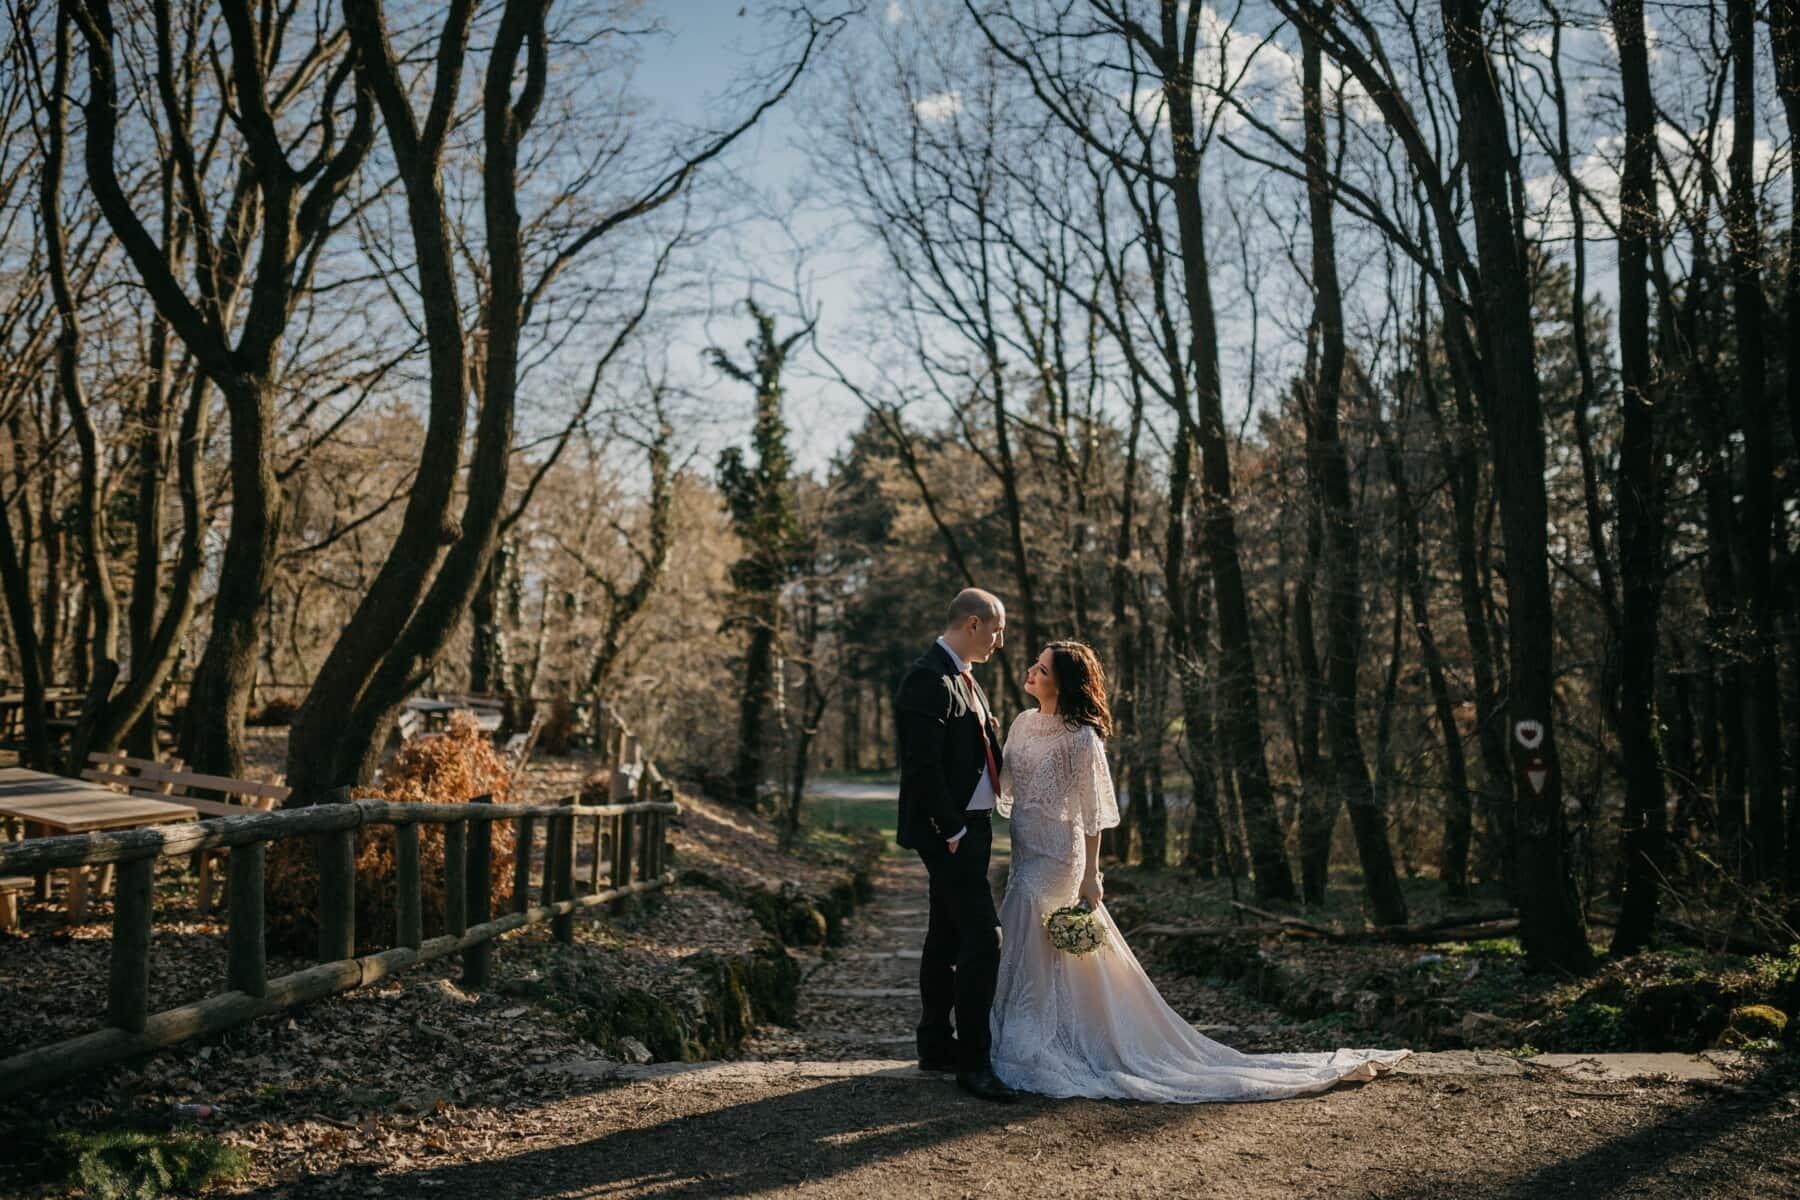 романтика, младоженец, булката, гора, сянка, Слънчев, есенния сезон, Момиче, сватба, двойка